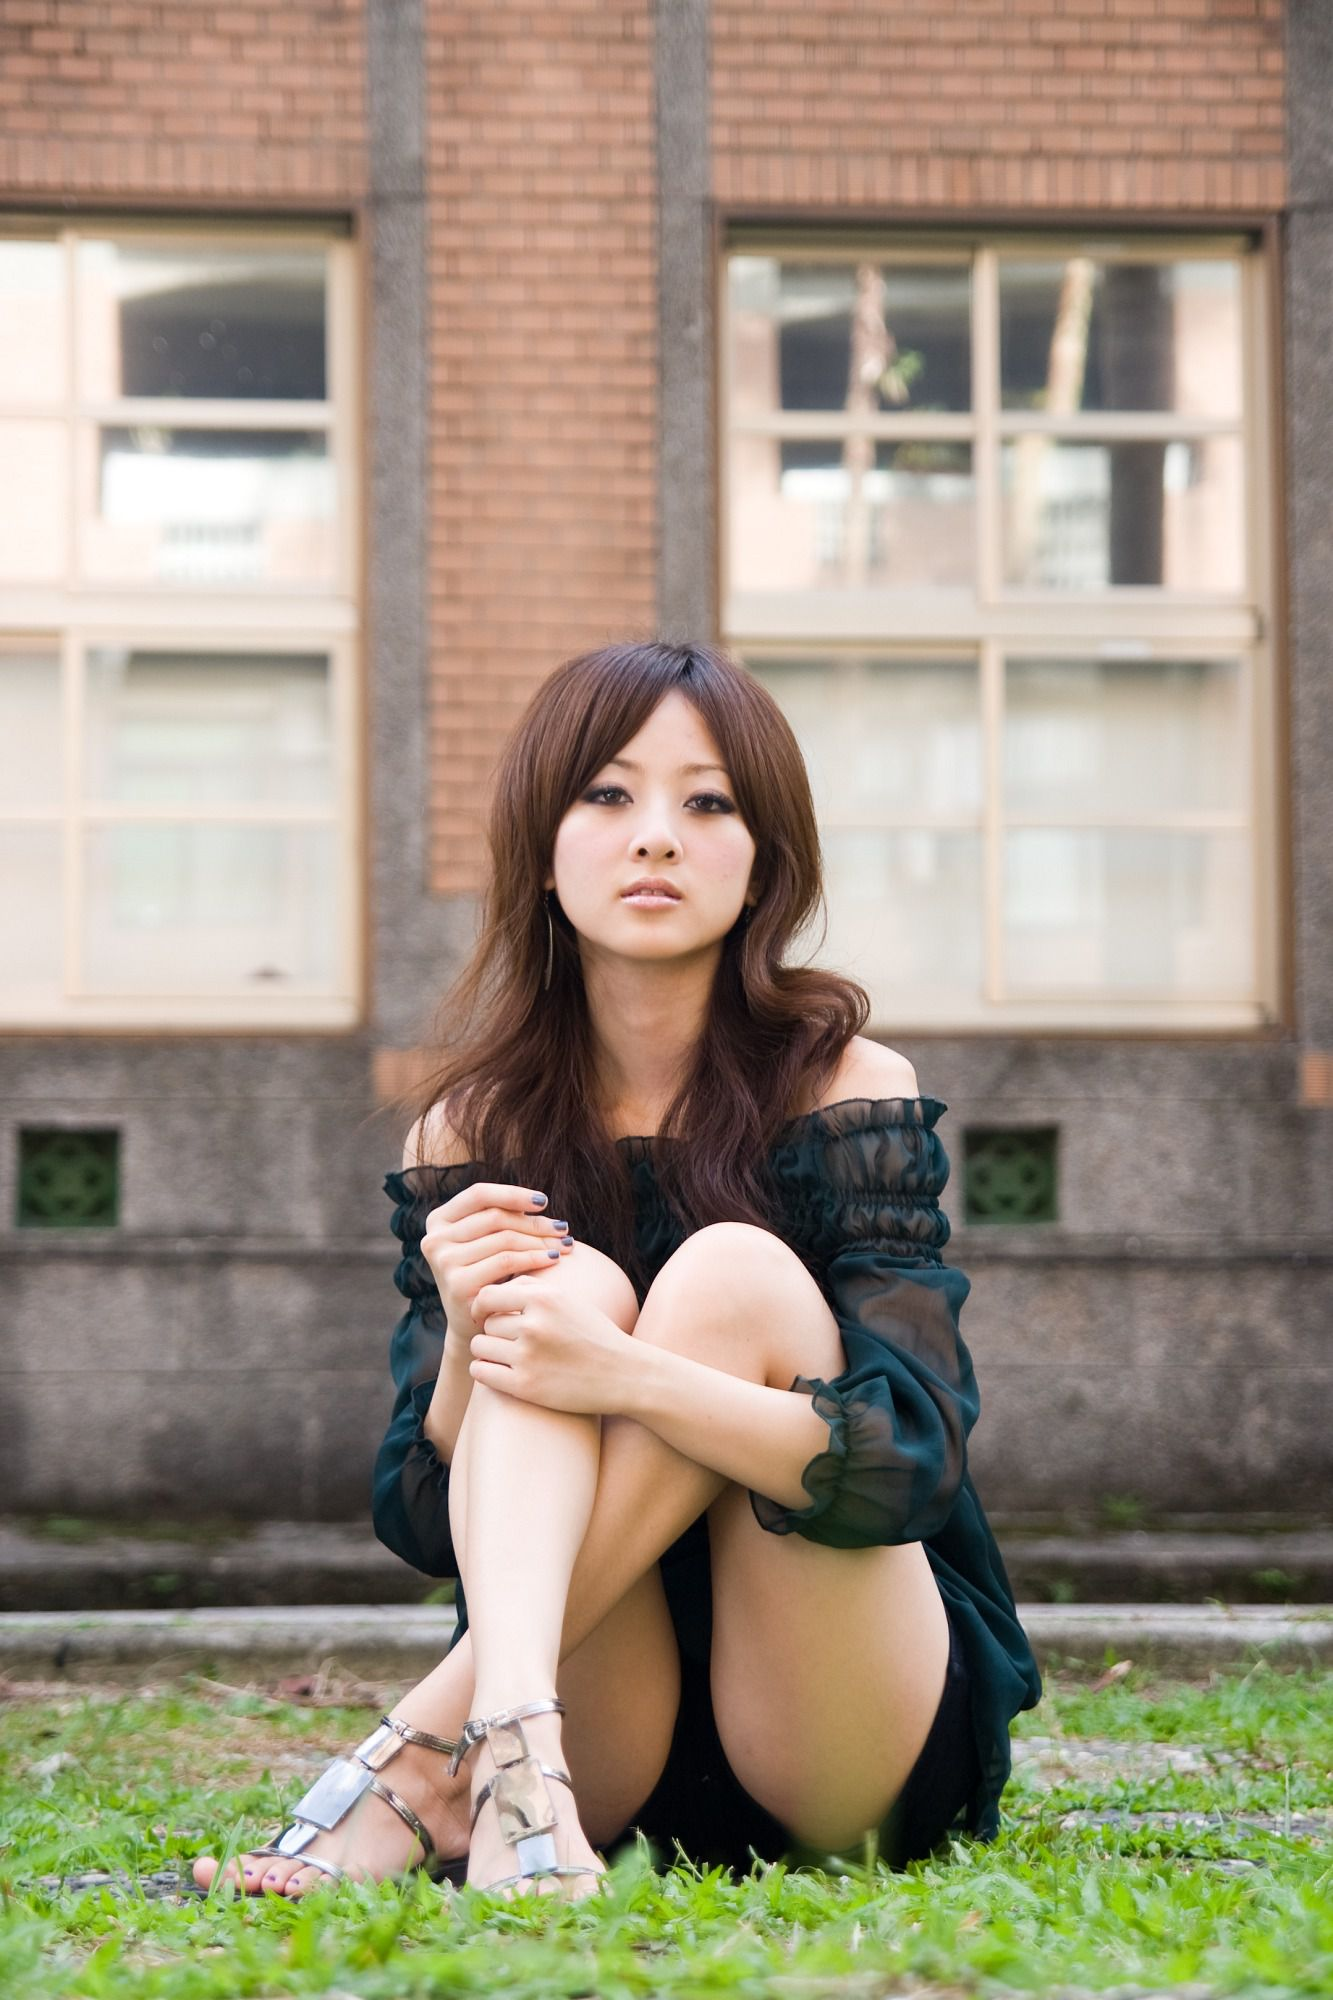 VOL.674 [网络美女]清纯甜美正妹女友:张凯洁(张允霏,果子MM)高品质写真套图(119P)